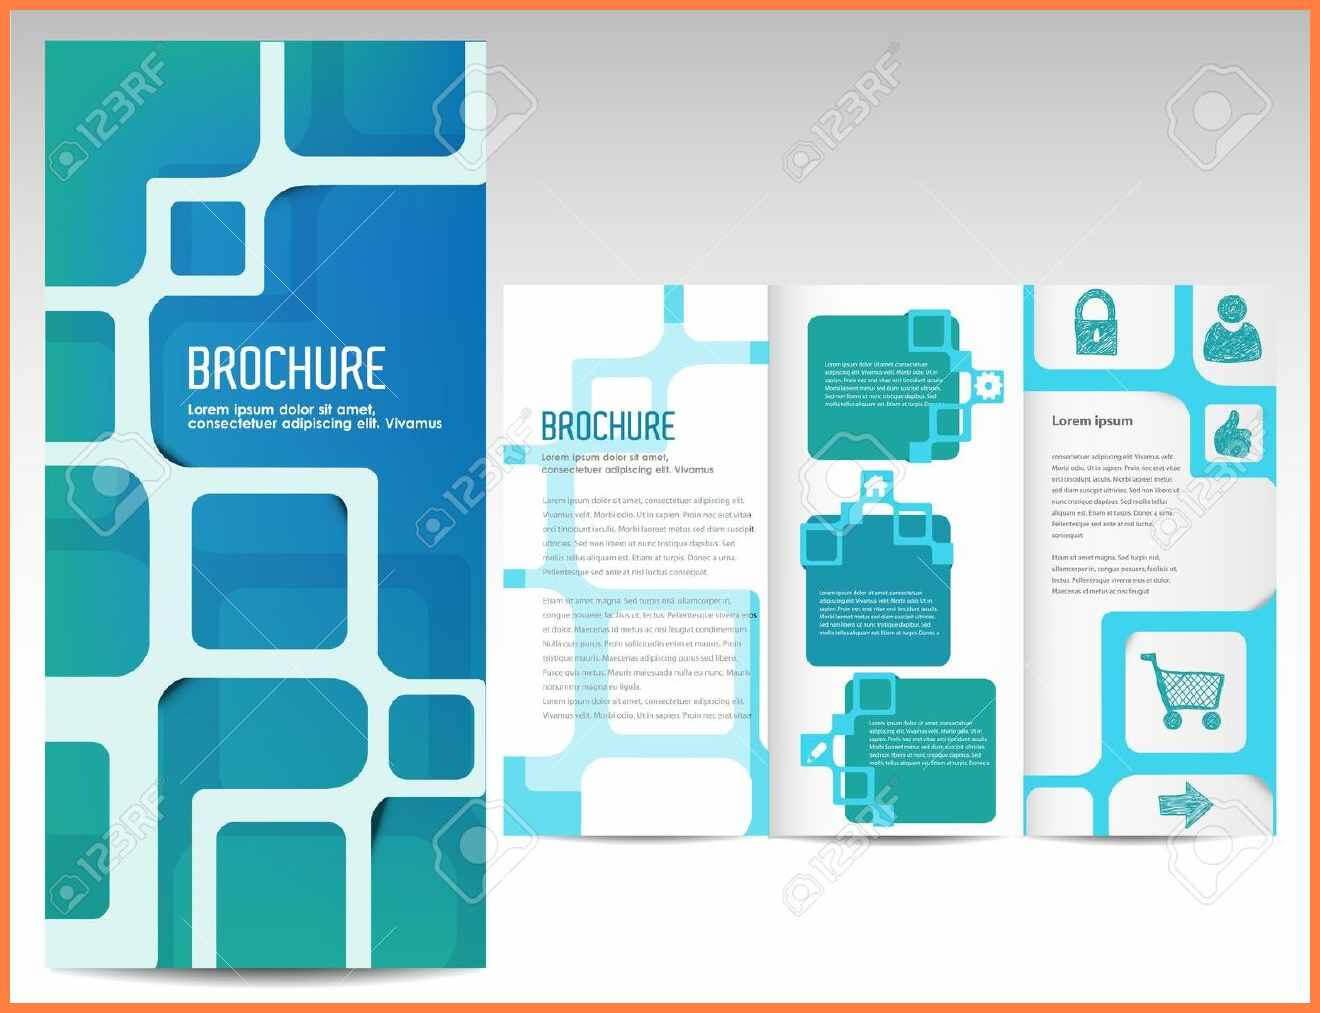 001 Free Microsoft Word Tri Fold Brochure Templates Template Throughout Free Tri Fold Brochure Templates Microsoft Word